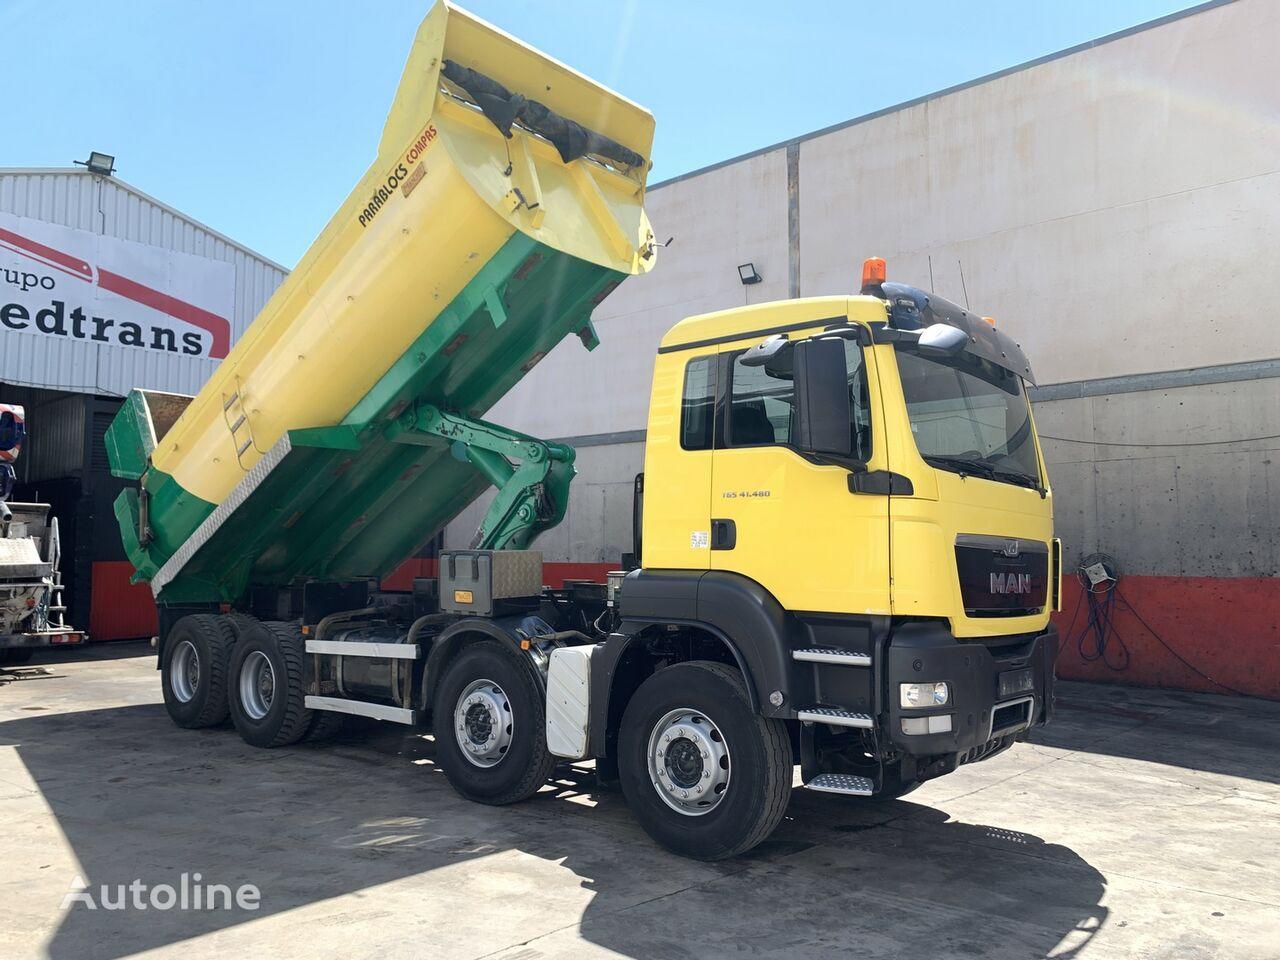 MAN TGS.41.480 dump truck